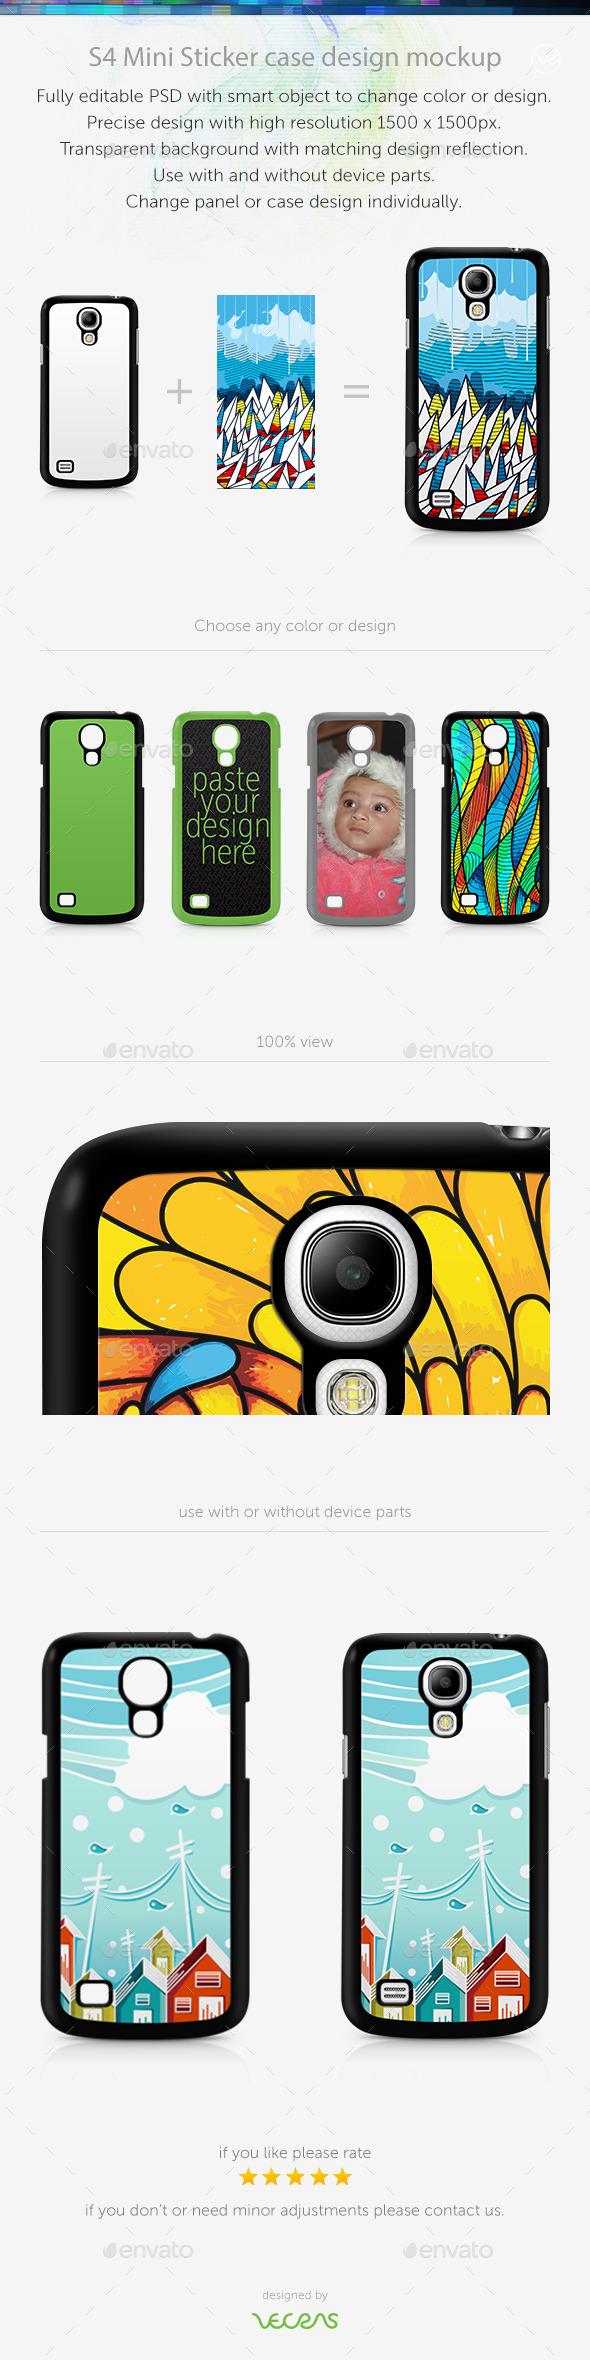 S4 Mini Sticker Case Design Mockup - Mobile Displays